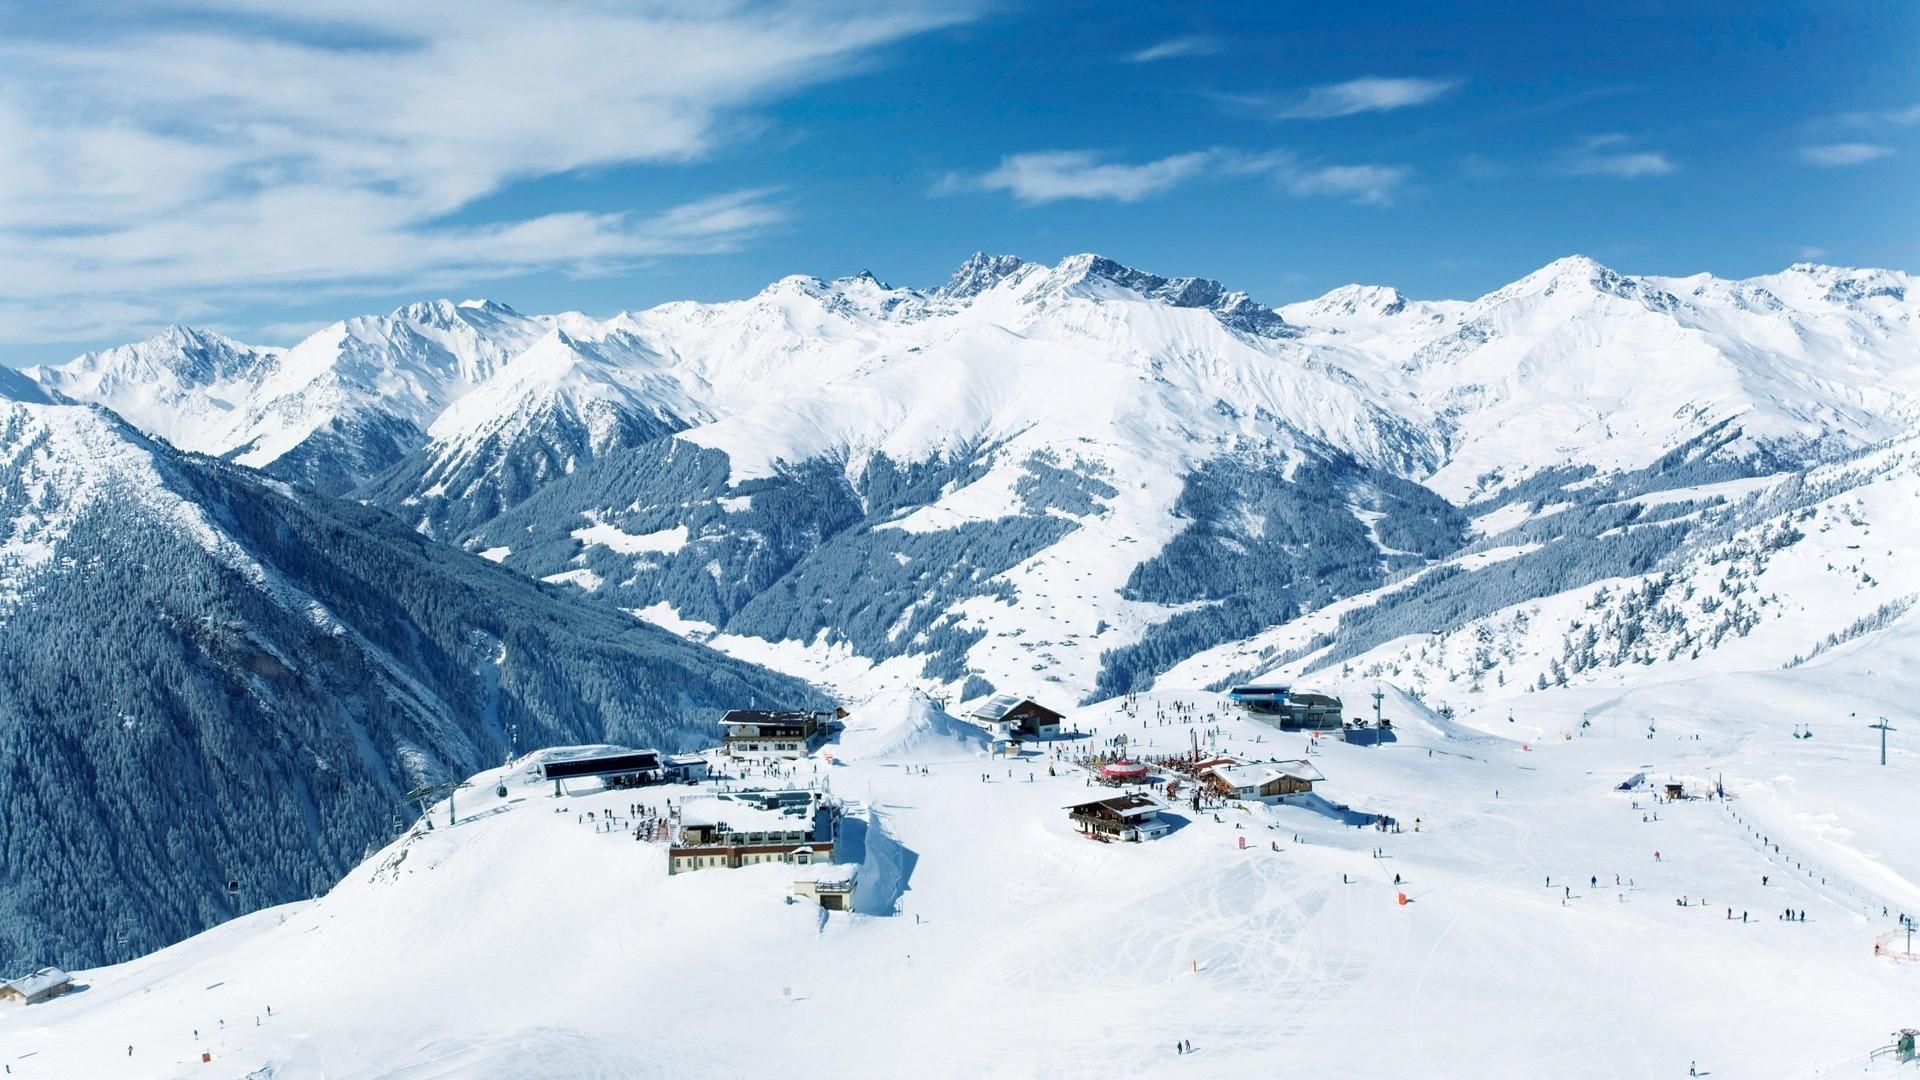 Alps Wallpaper 64 Pictures